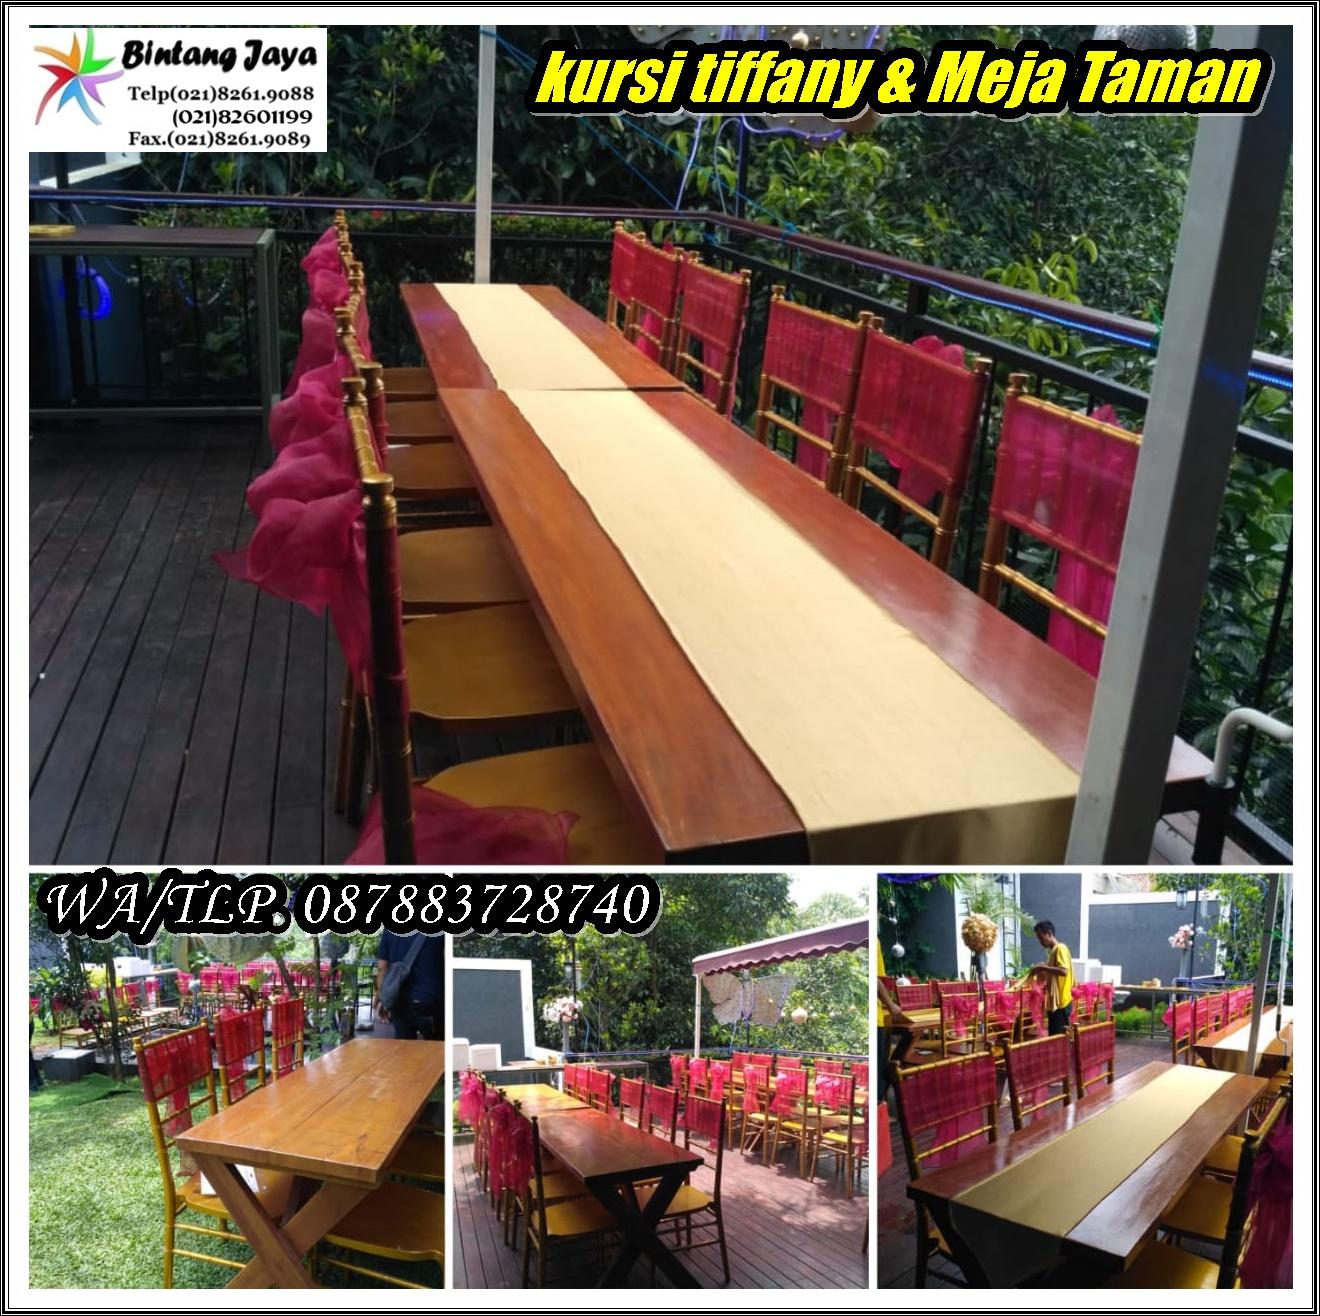 Sewa Kursi Tiffany Rawamangun Jakarta